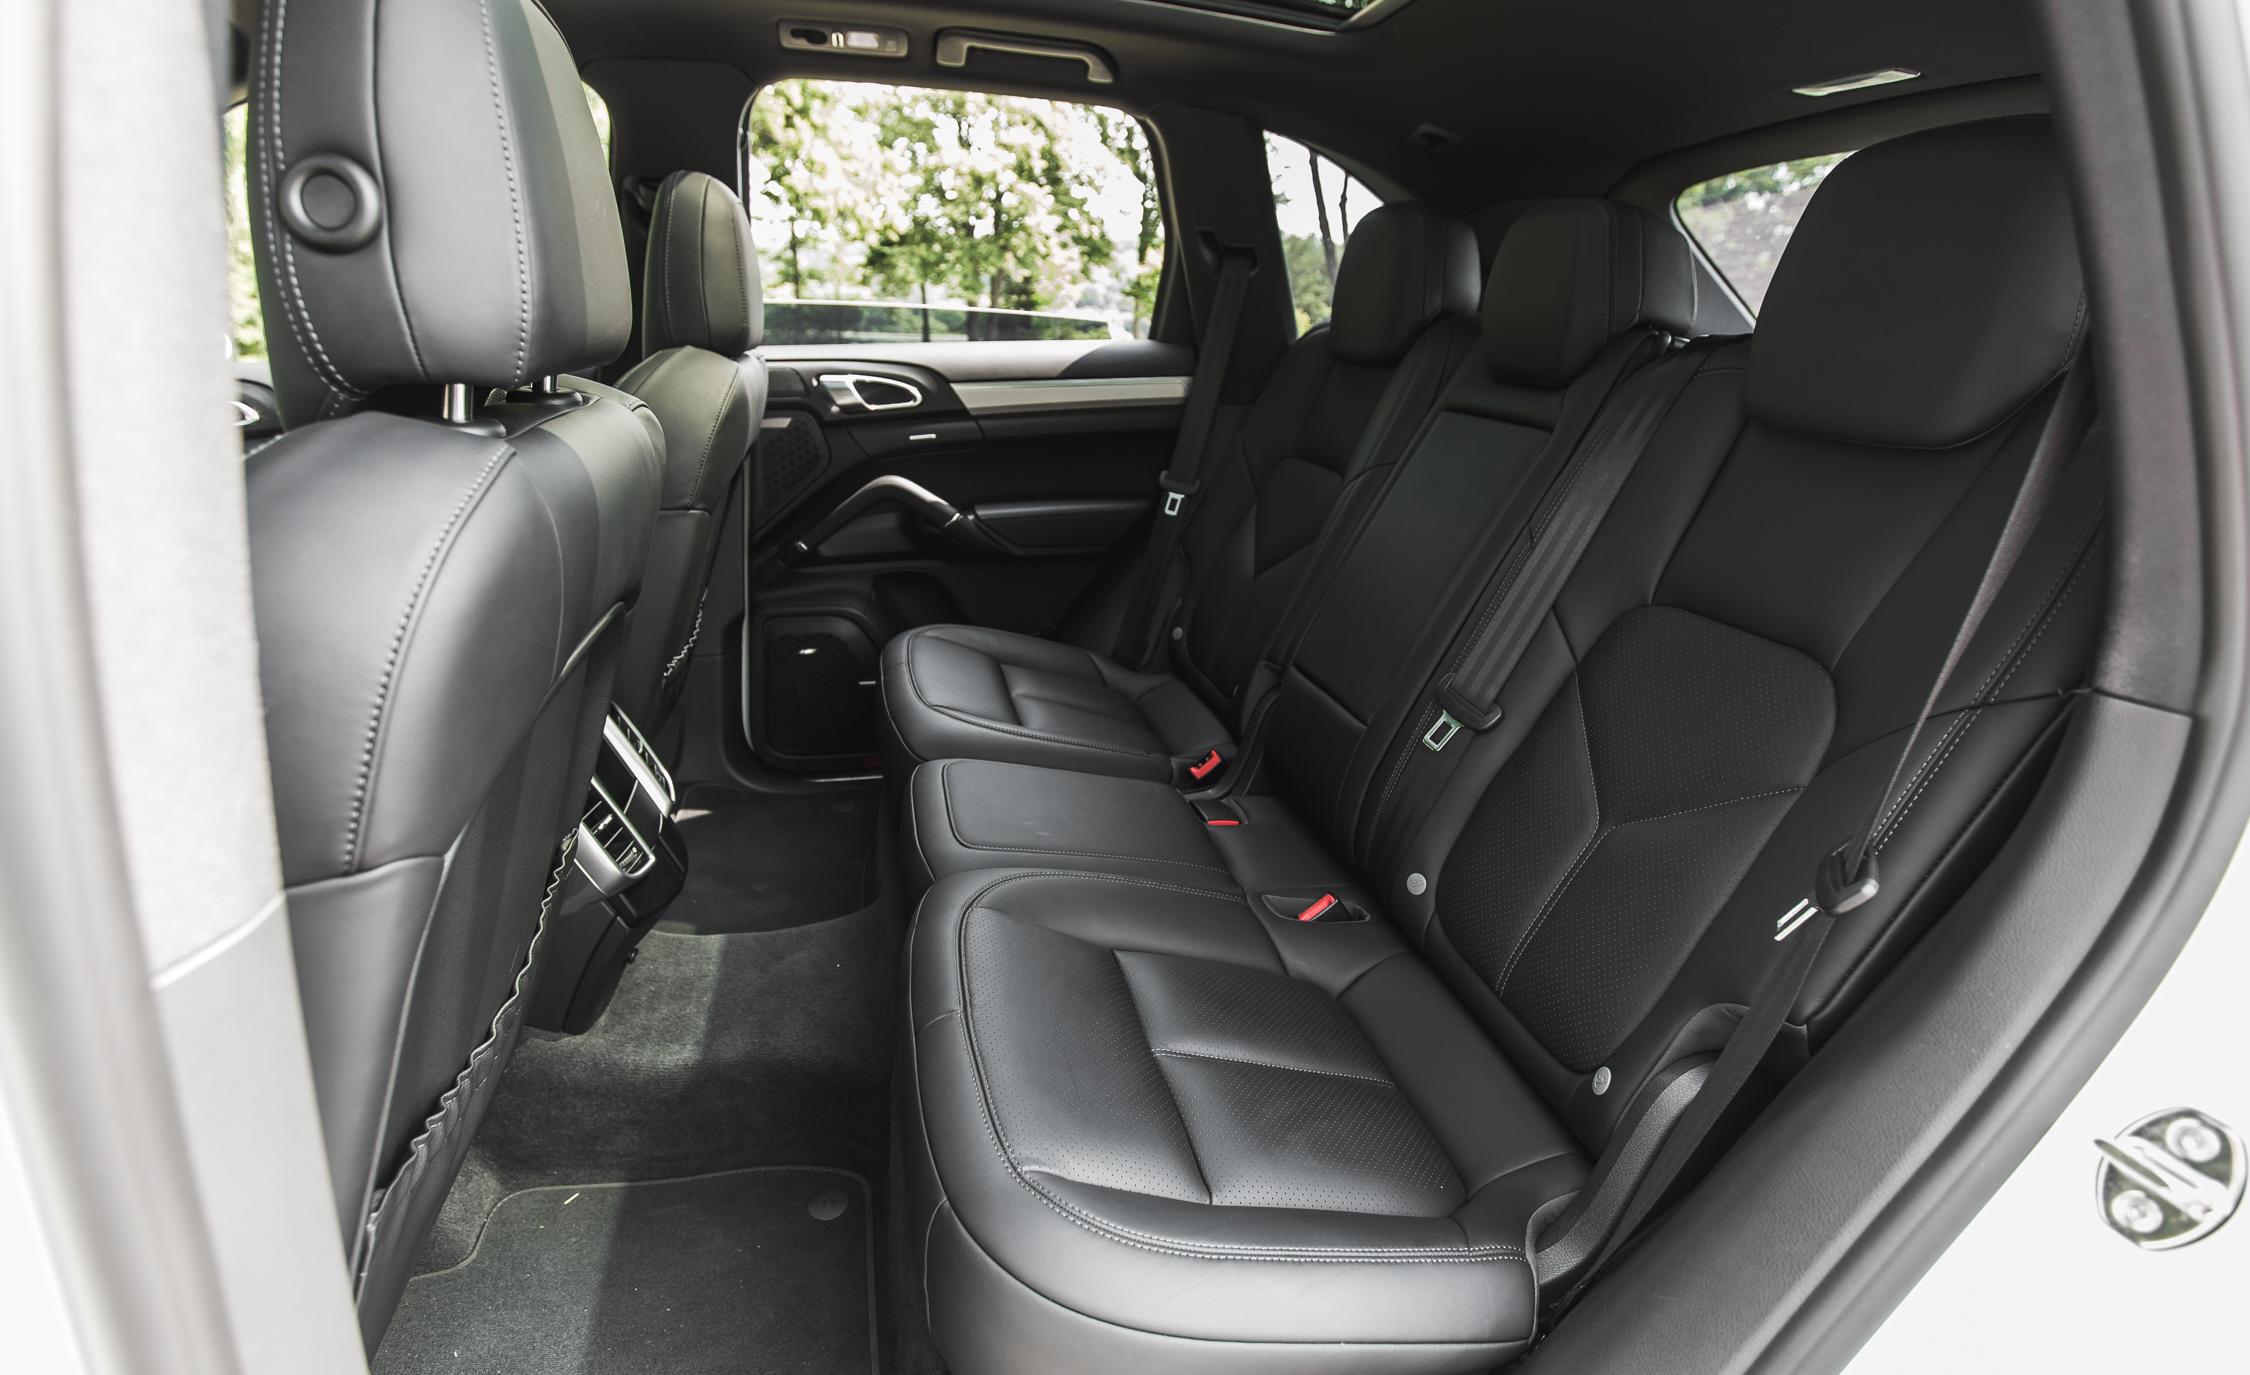 2015 Porsche Cayenne S E-Hybrid Interior Rear Passenger Seats